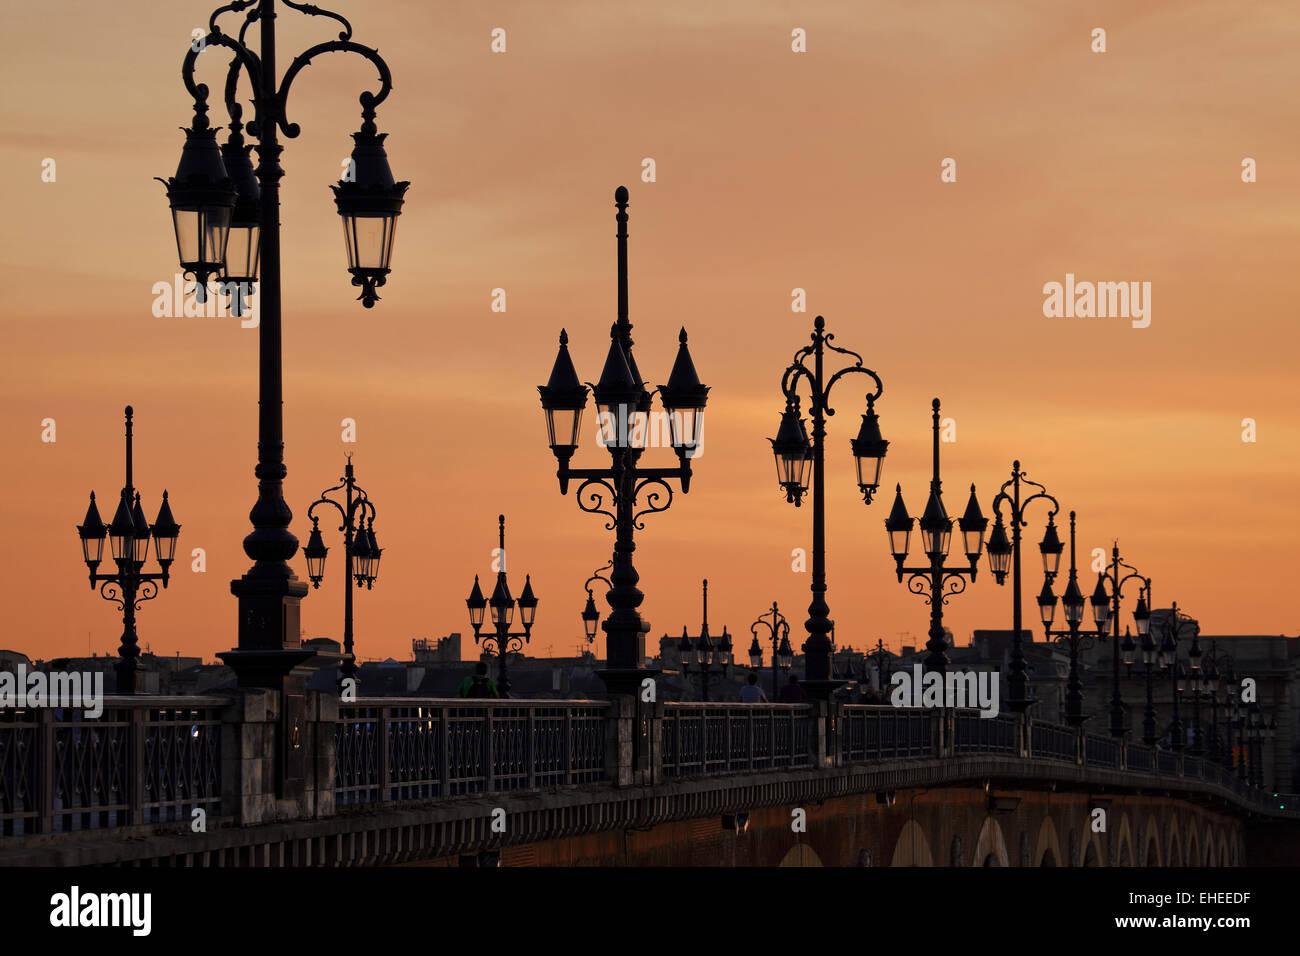 Lanterns over the bridge Pont de Pierre - Stock Image